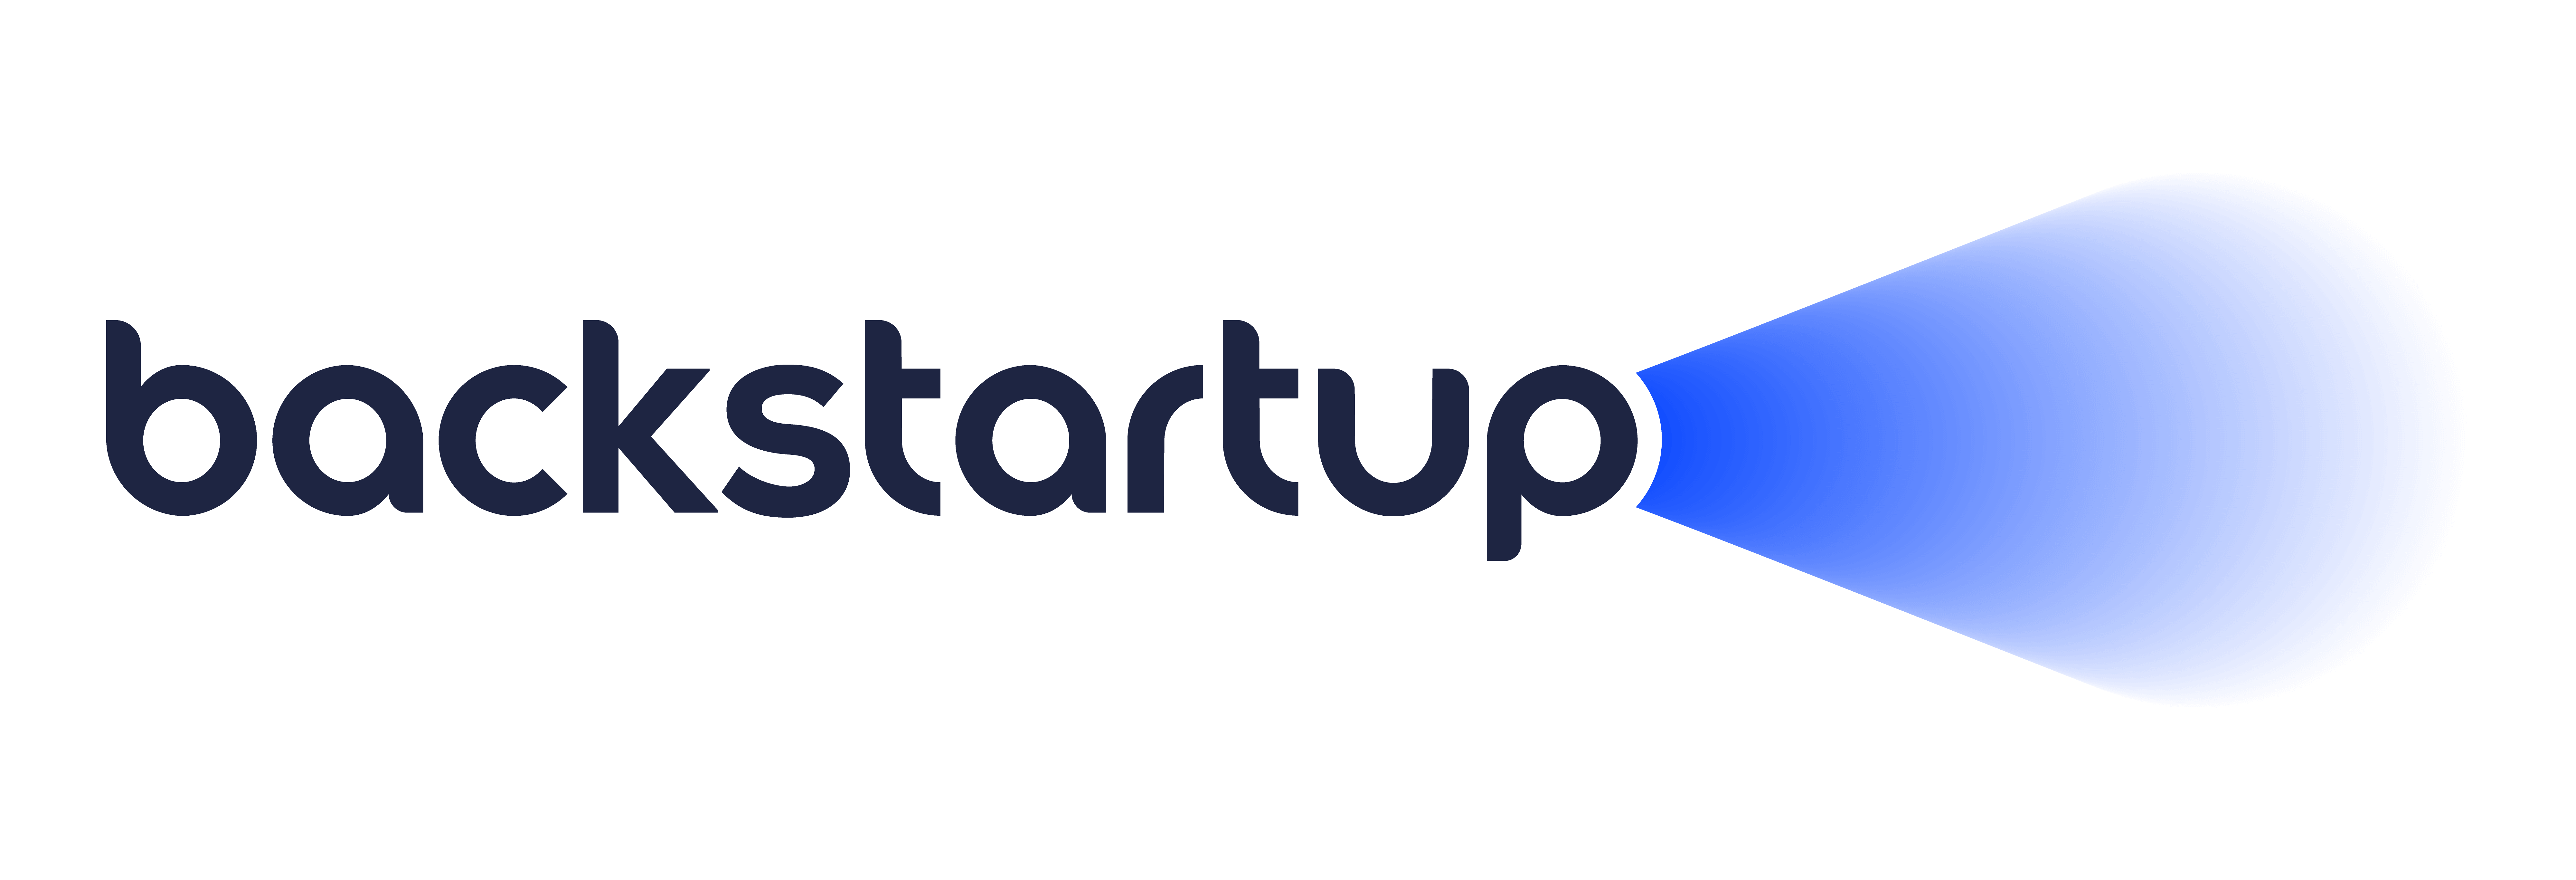 logo backstartup